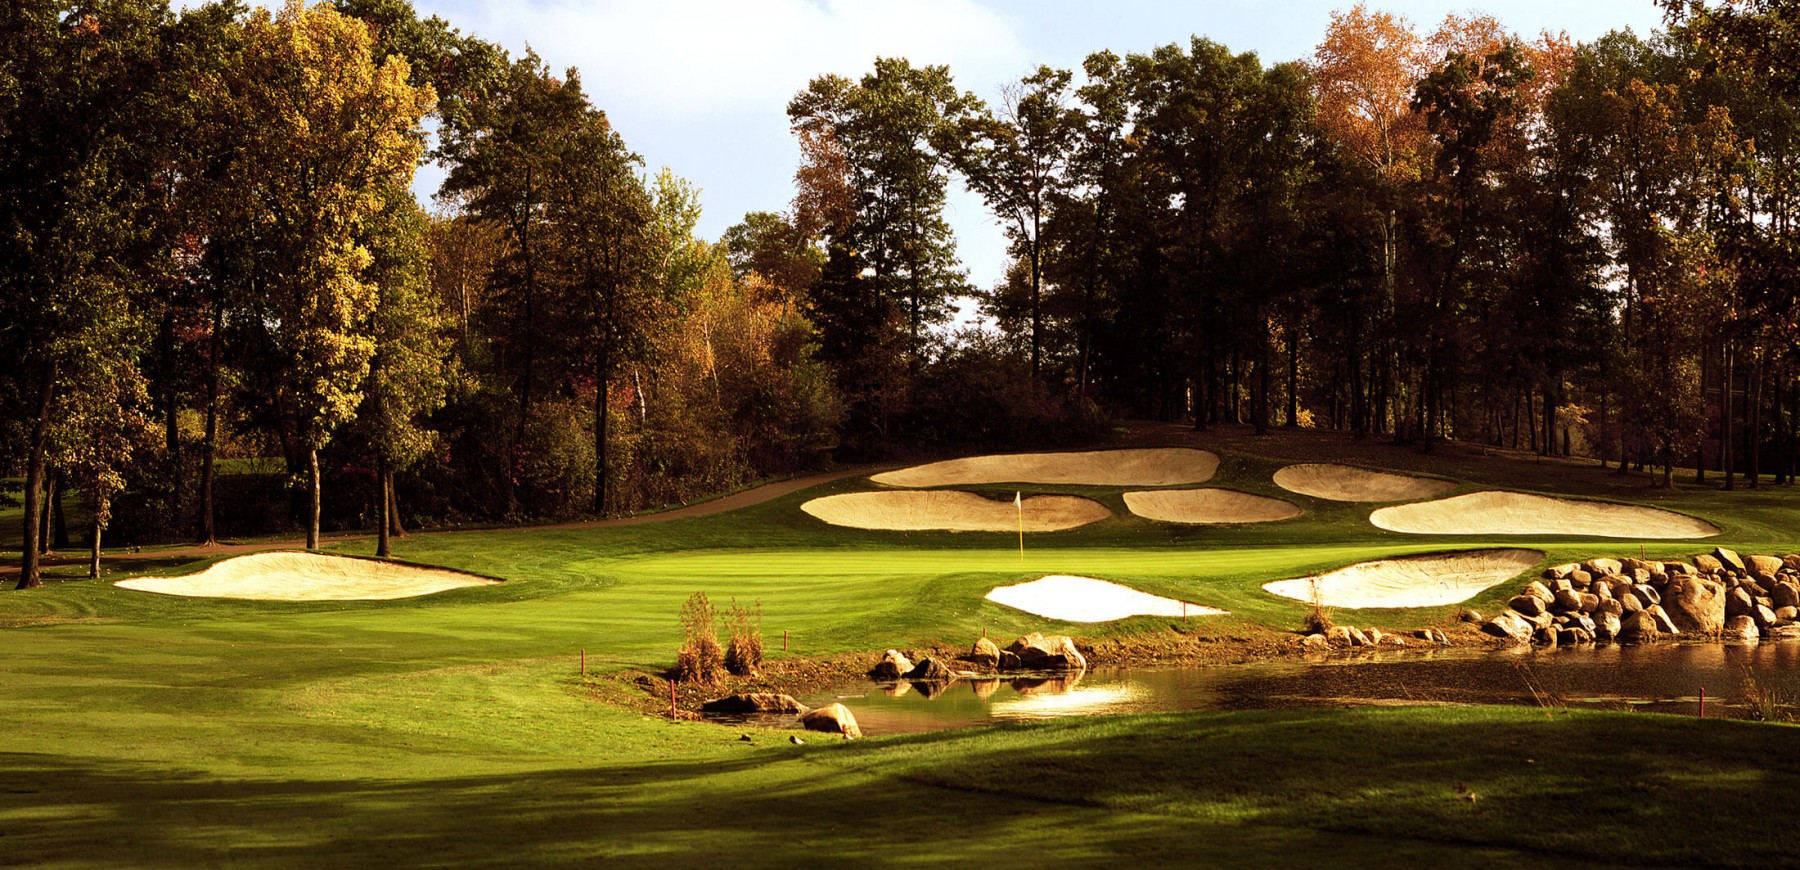 The Classic #11 Brainerd Golf Course